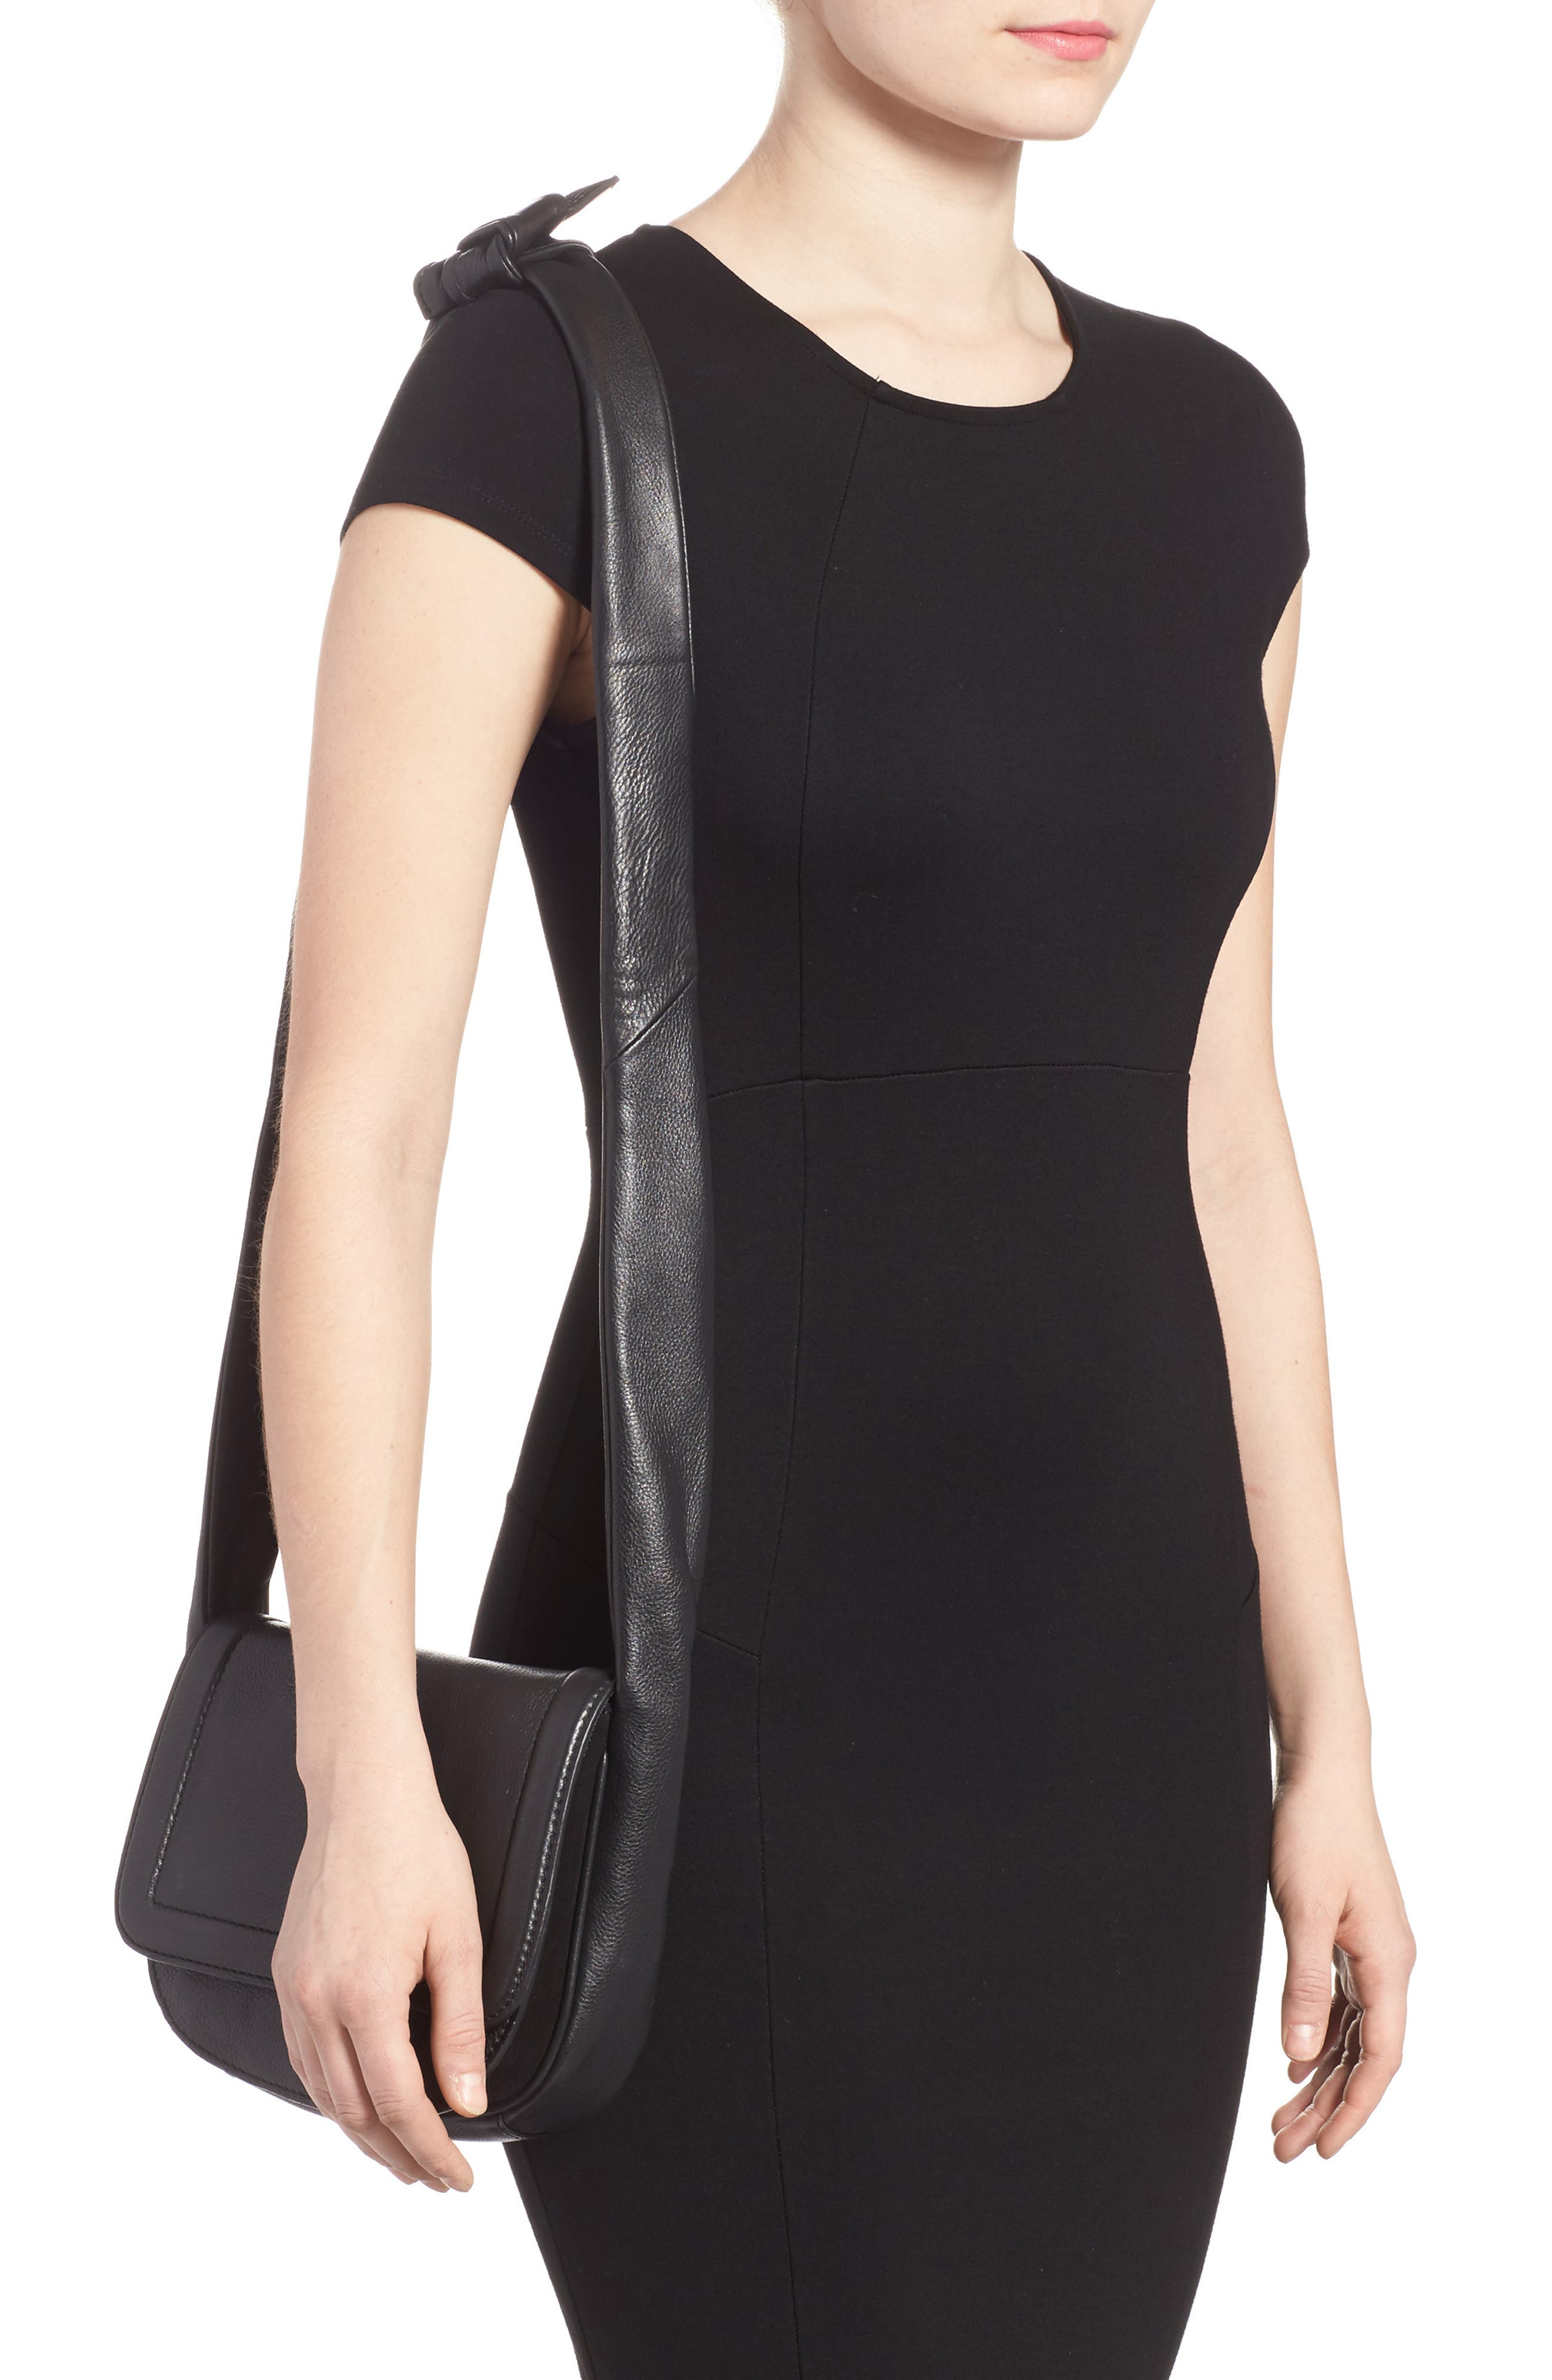 Jasmine Leather Saddle Bag,                             Alternate thumbnail 2, color,                             Black